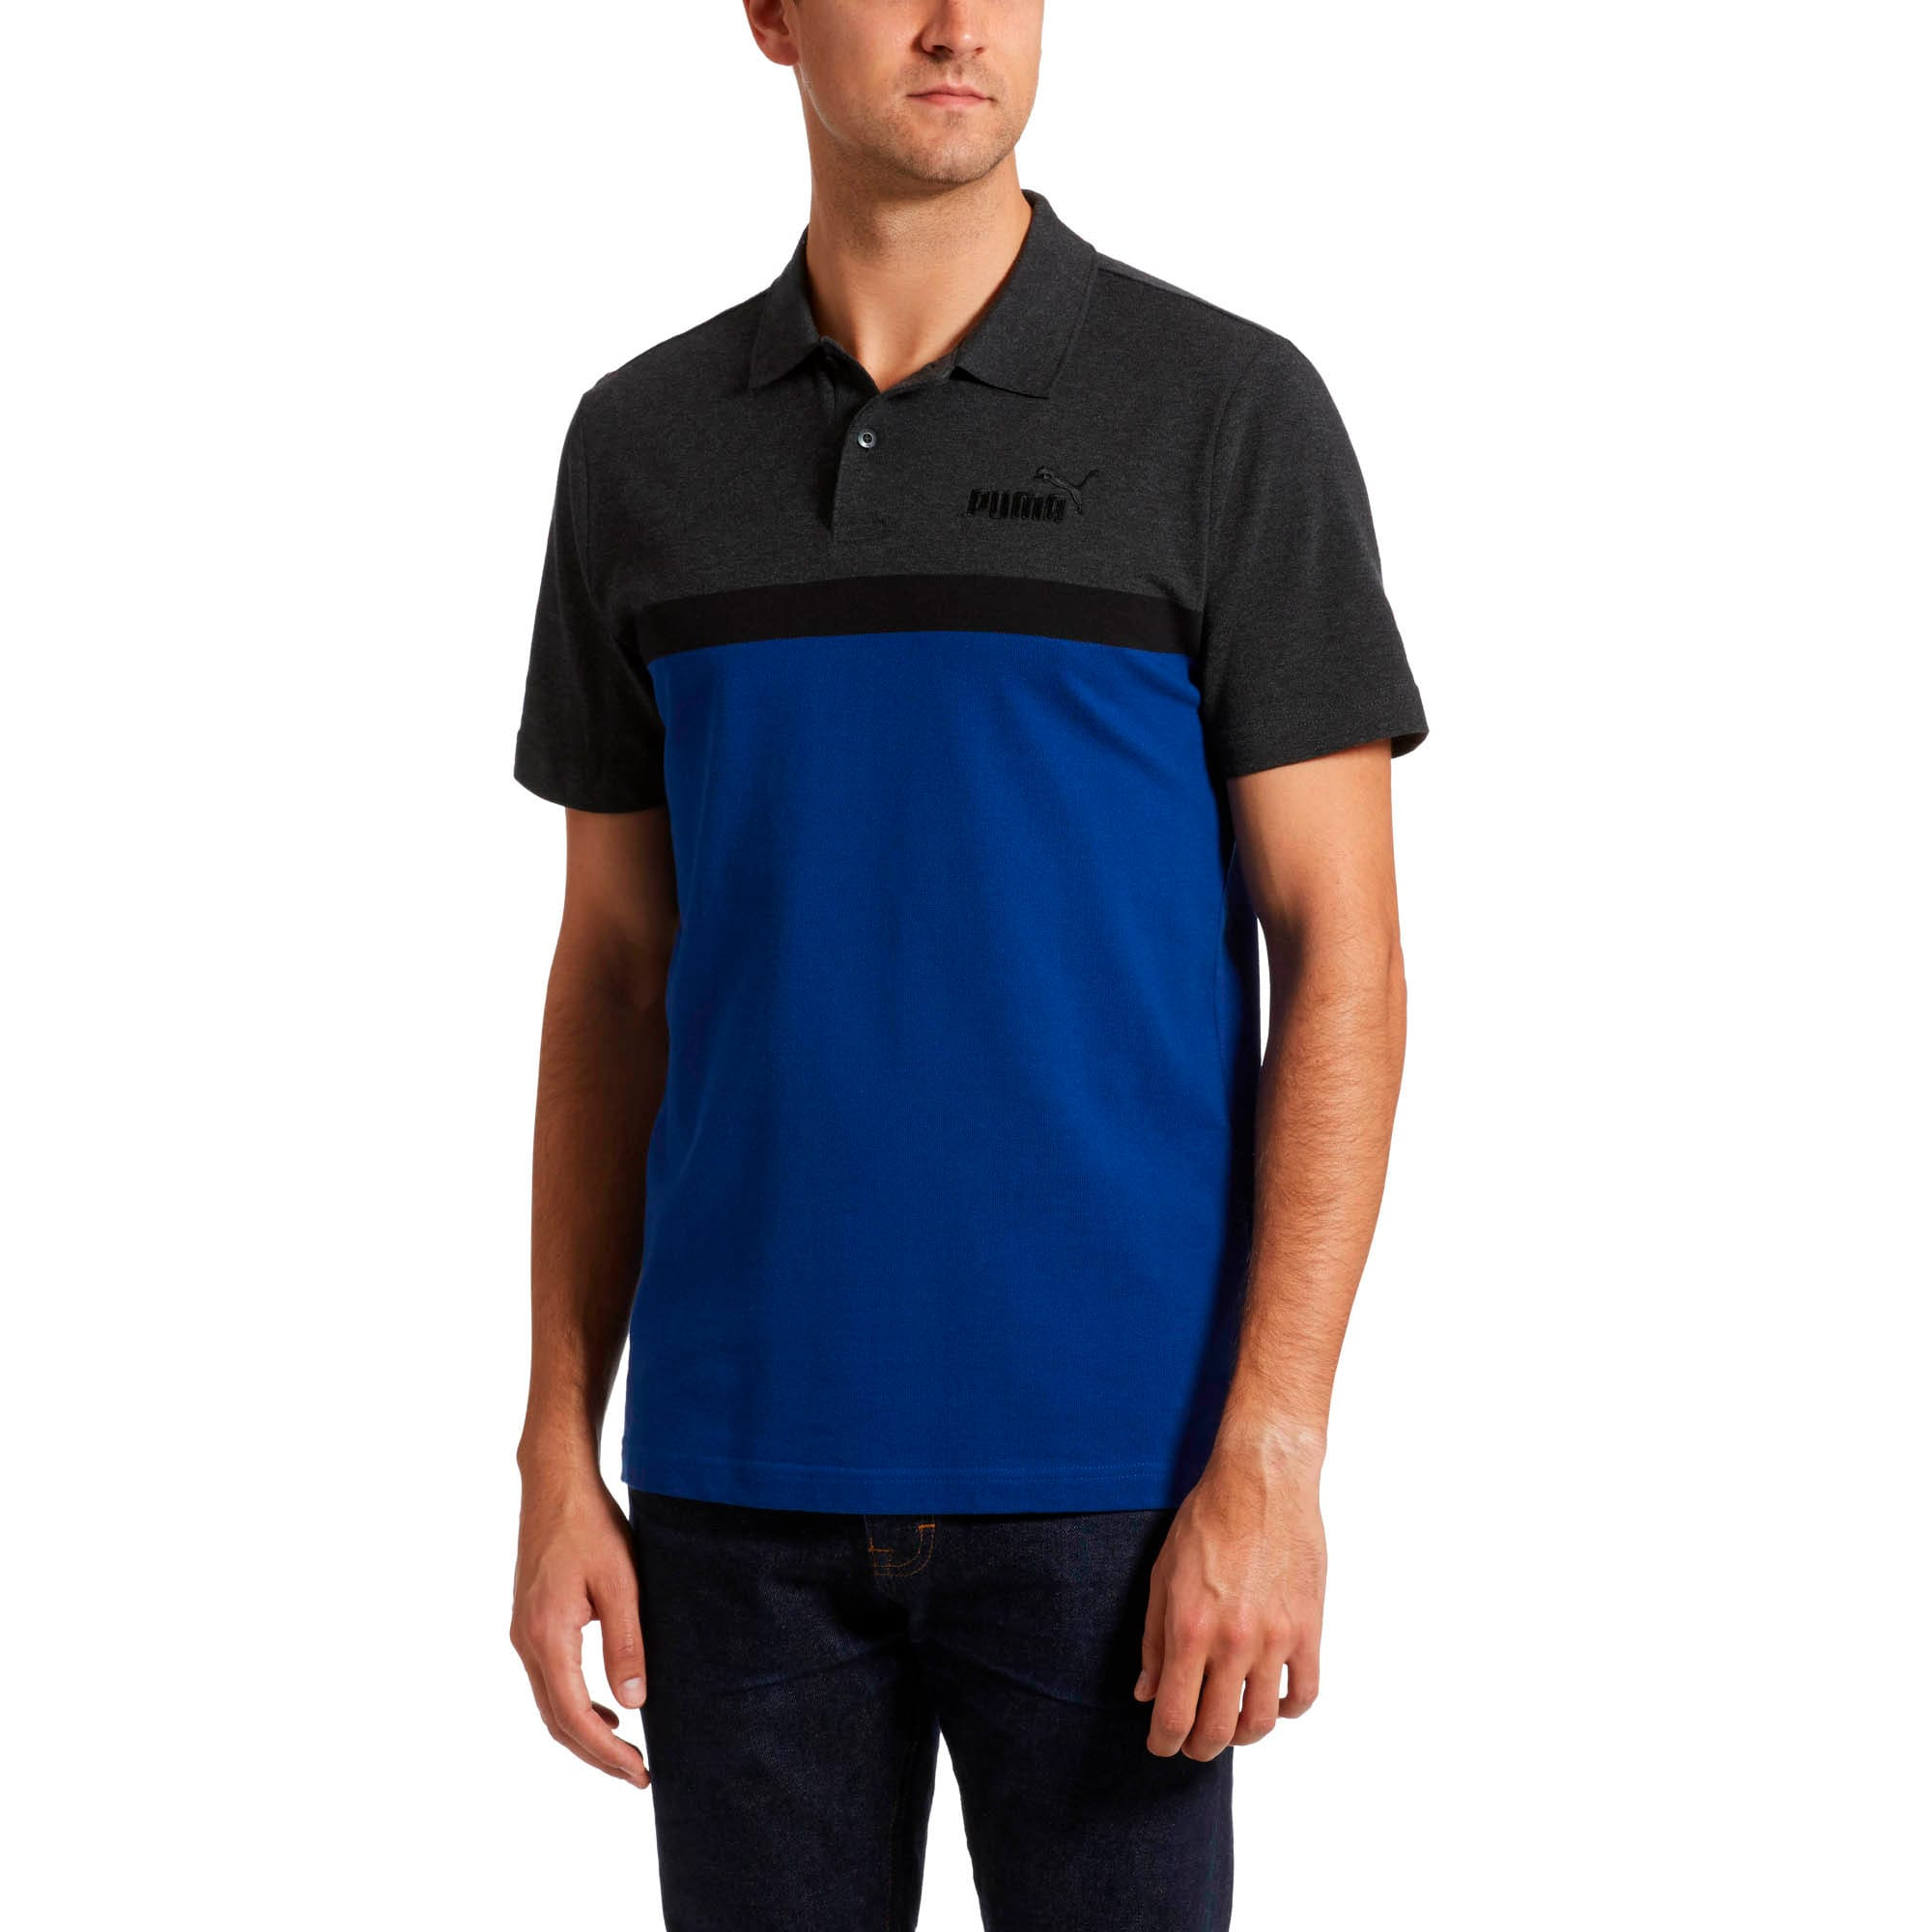 Thumbnail 2 of Essentials+ Stripe Men's Polo, Sodalite Blue, medium